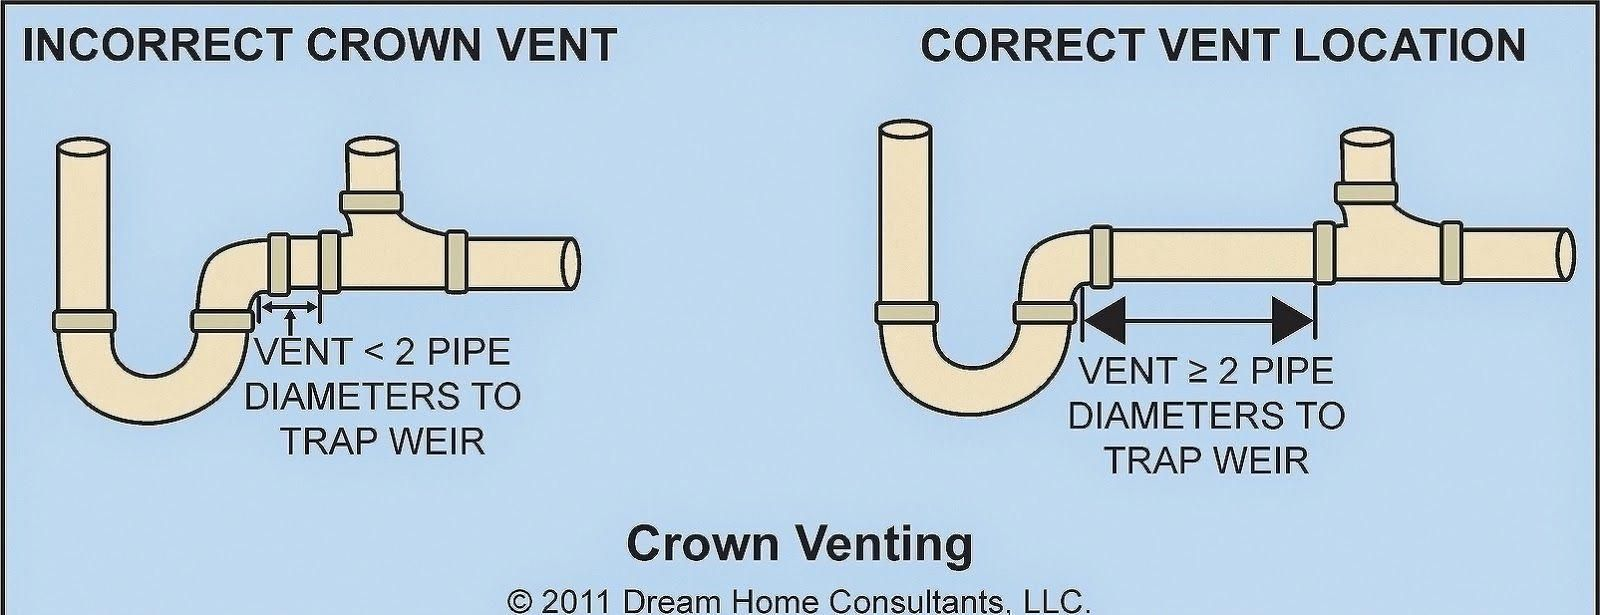 Plumbing Forum Plumbing Tools 2019 Plumbing 15mm To 10mm Reducer